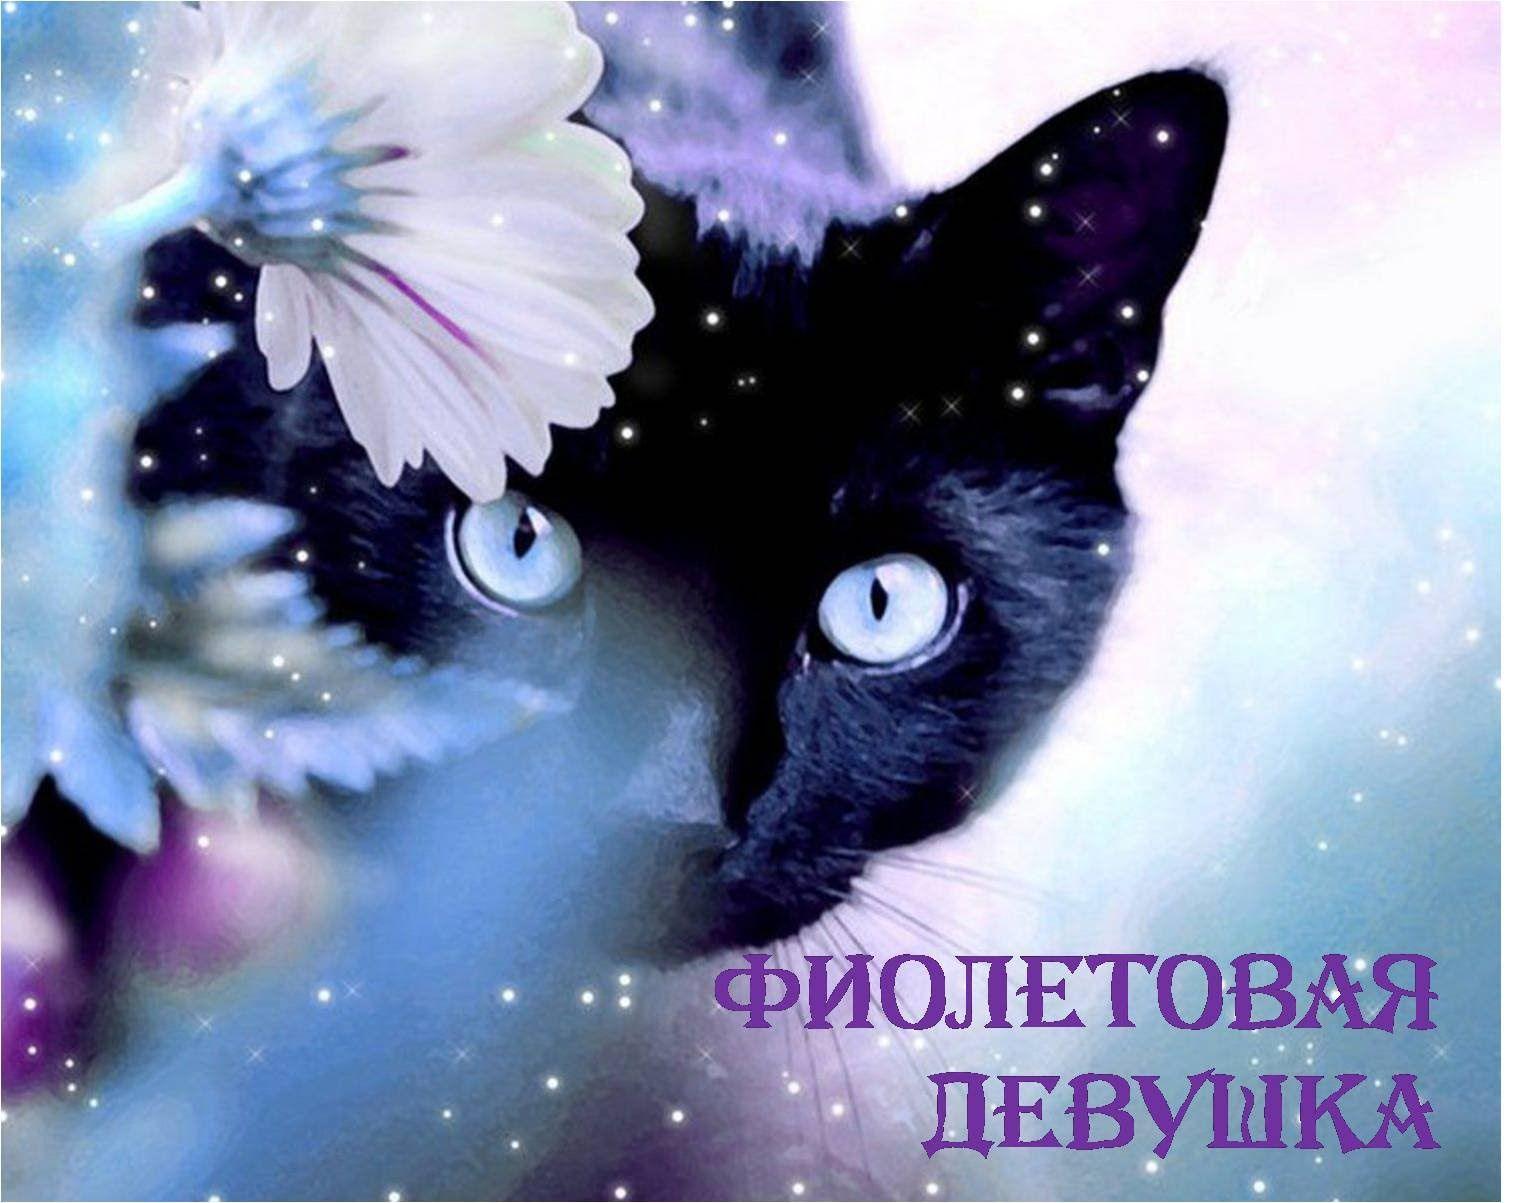 Top Wallpaper Minecraft Cats - ca369b3926b1eea490b2ec05a057e227  Snapshot_708430.jpg